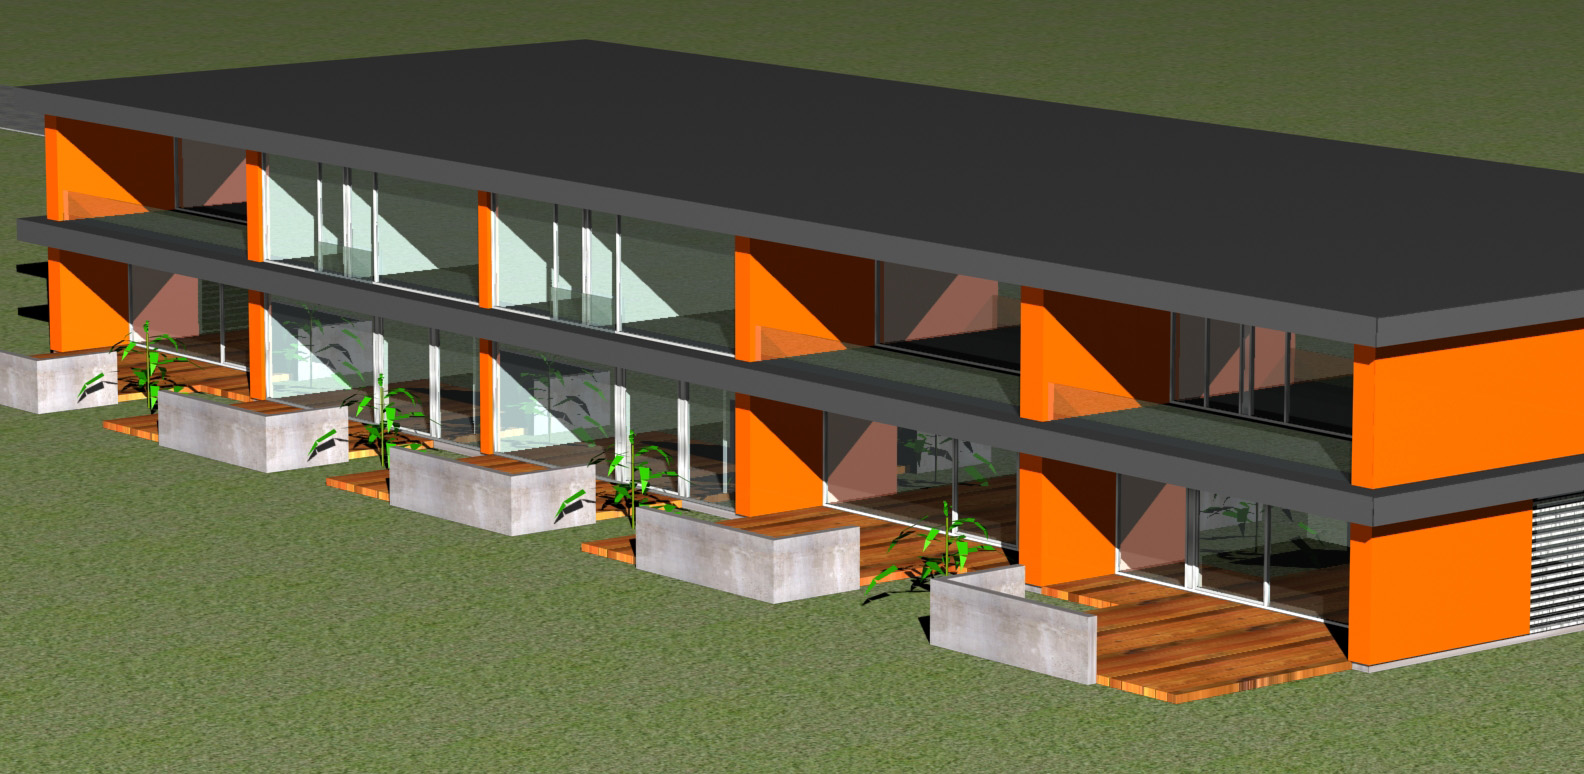 TERRACED HOUSES (19 BUILDINGS) IN APAMETSA |RIDAELAMUD (19 HOONET 87 BOKSI) - APAMETSA, TABASALU, HARJUMAA| РЯДНЫЙ ДОМ (19 ЗДАНИЙ 87 БОКСОВ) - АПАМЕТСА, ТАБАСАЛУ, ХАРЬЮМАА